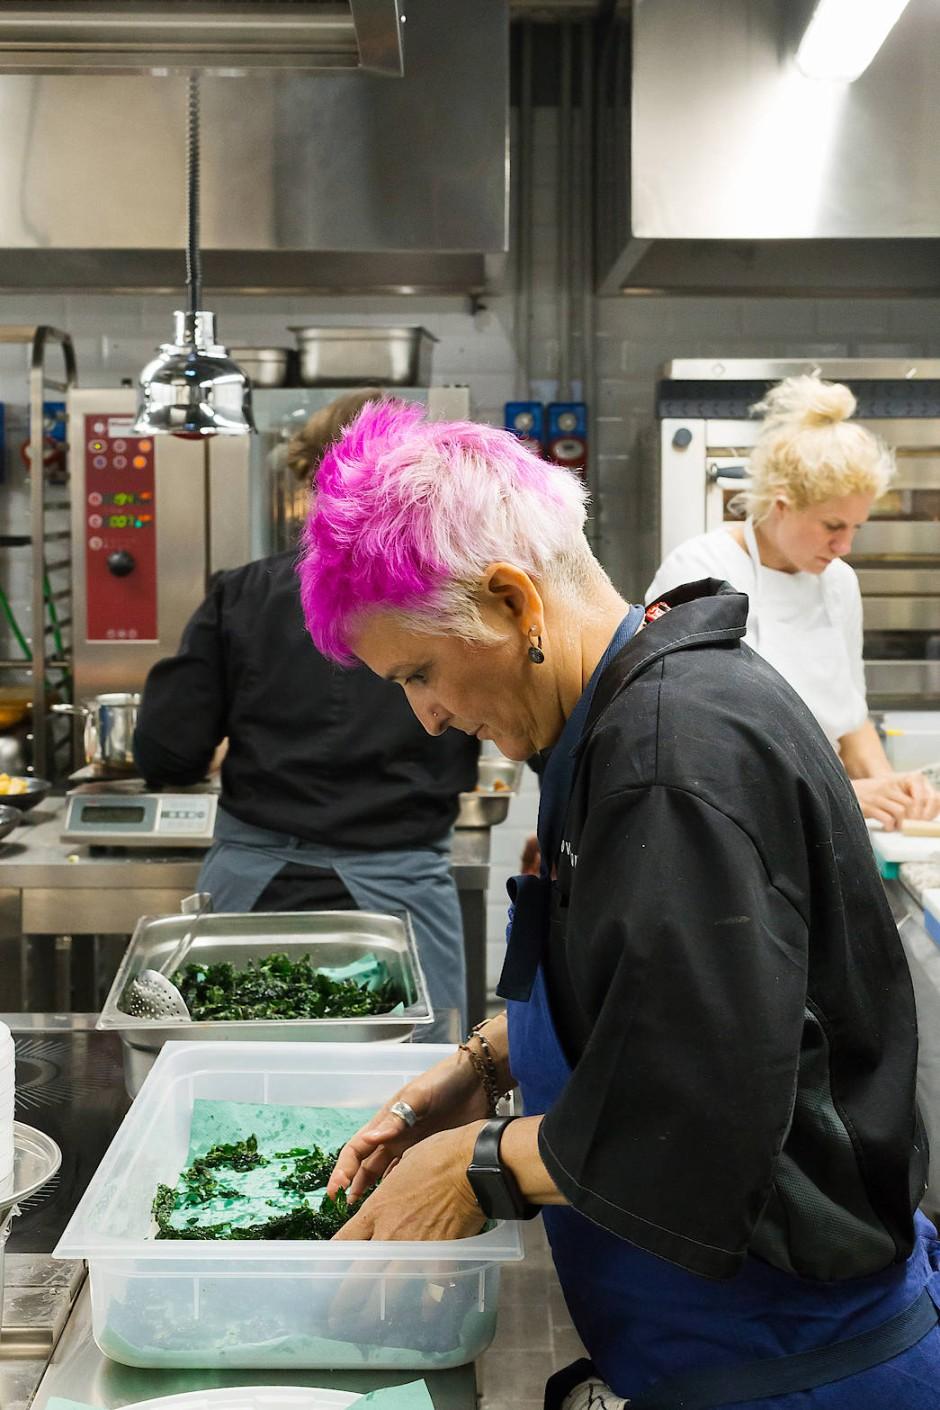 Michelinstern trotz später Kochkarriere: Christina Bowerman